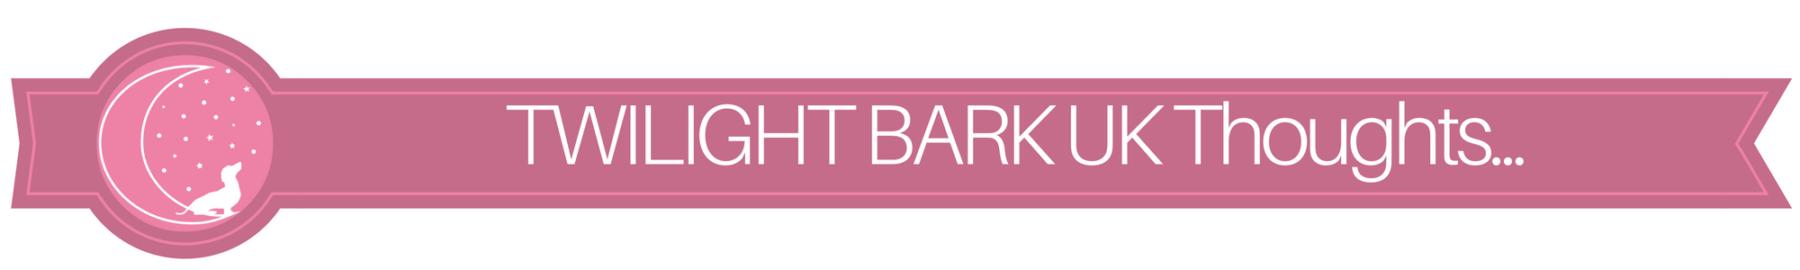 twilightbarkukthoughtsbanner1